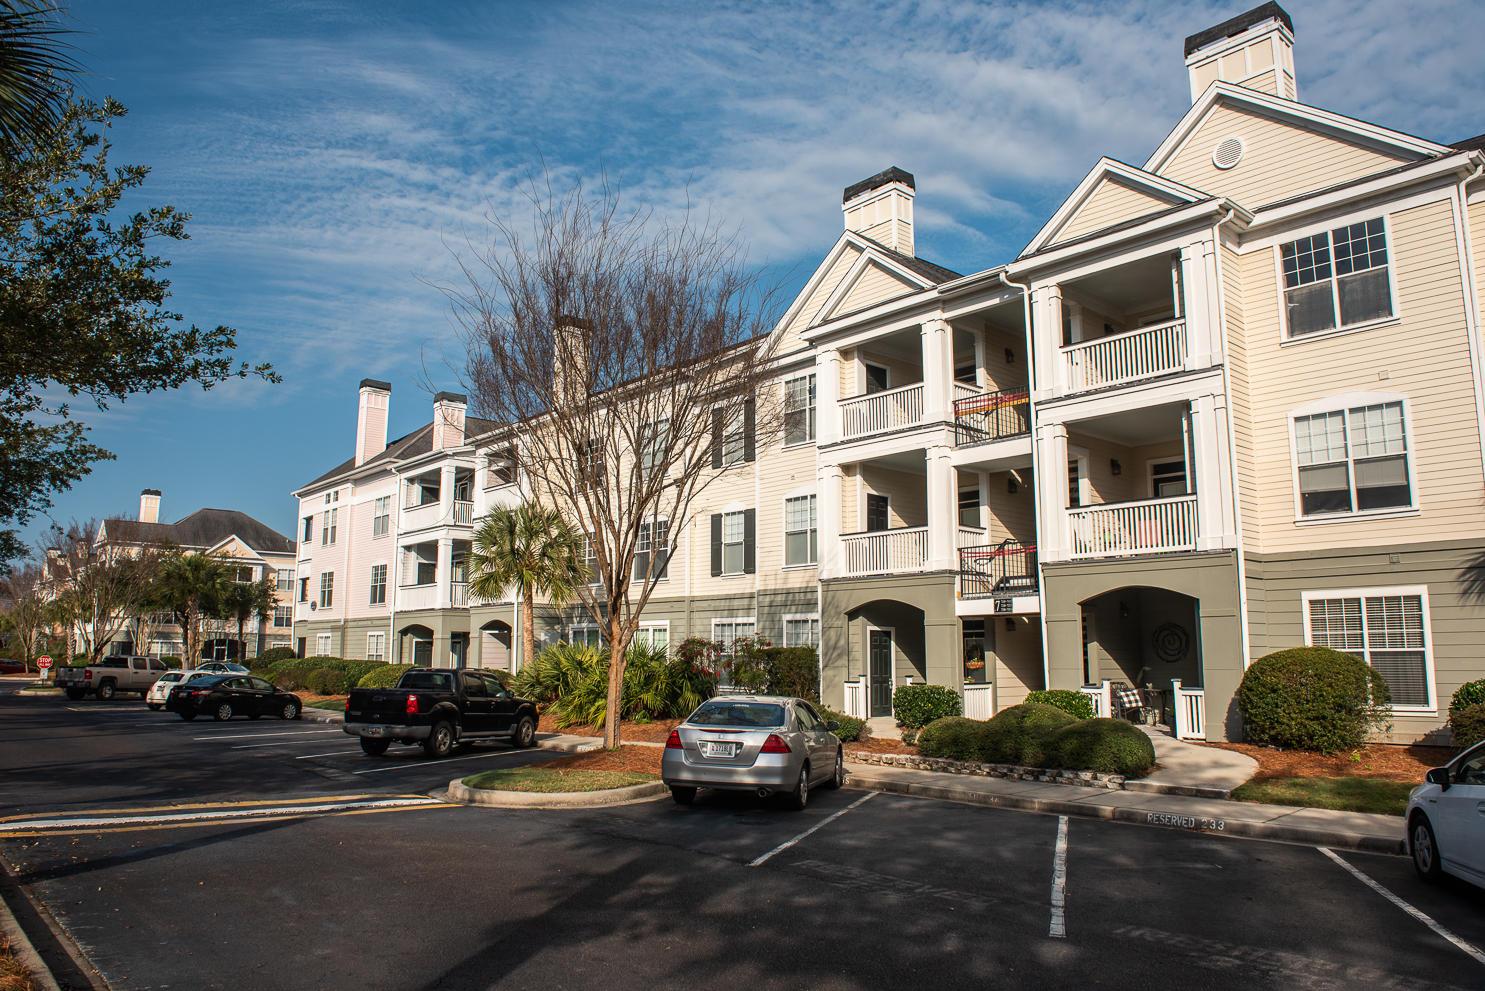 Daniel Landing Condos Homes For Sale - 130 River Landing, Charleston, SC - 13